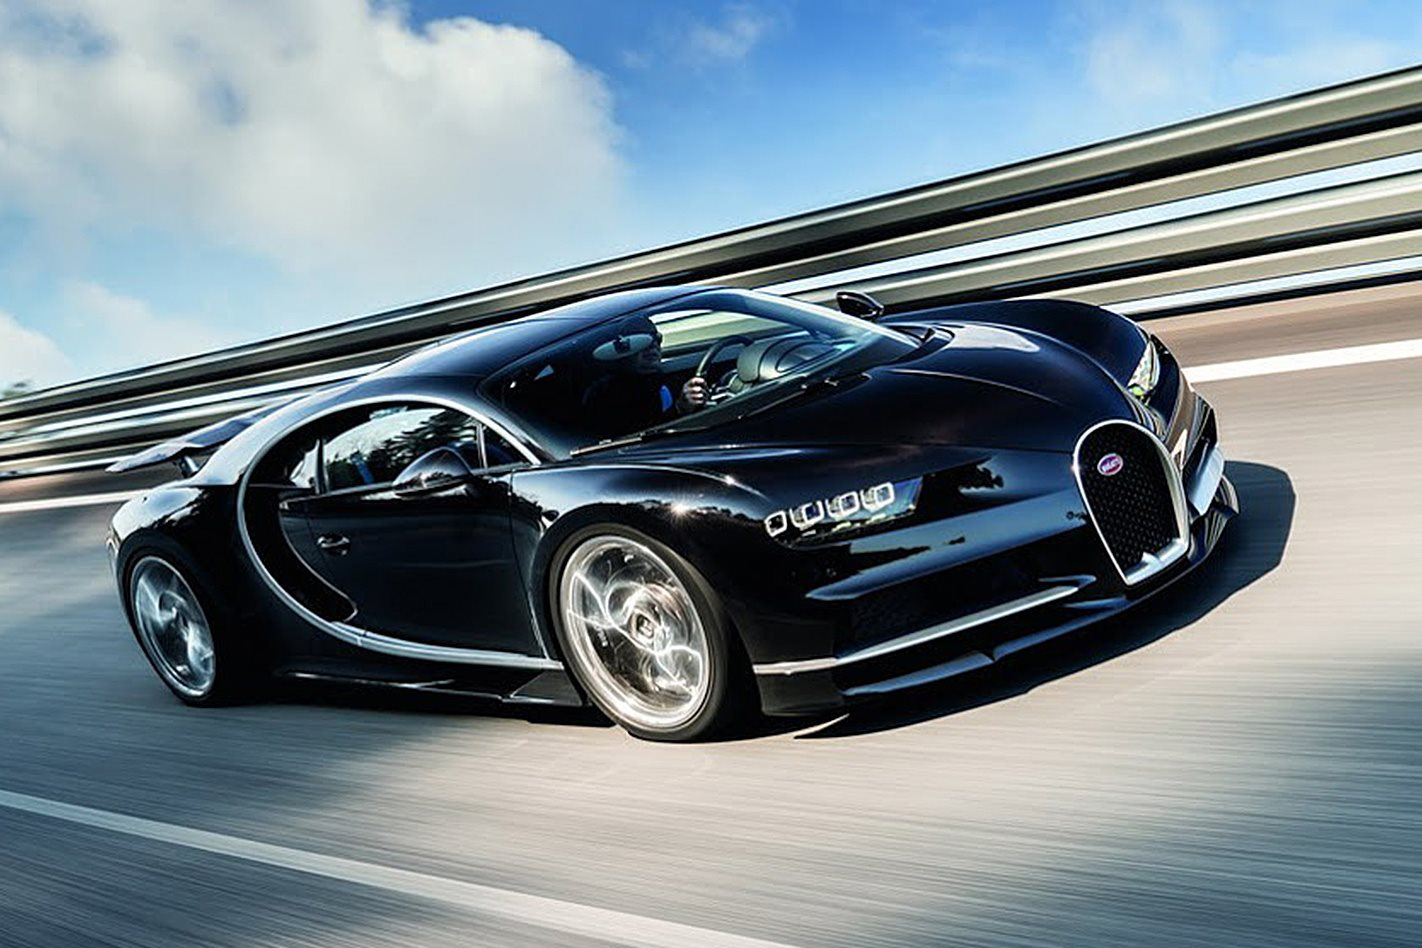 2016 geneva motor show 2017 bugatti chiron revealed wheels. Black Bedroom Furniture Sets. Home Design Ideas